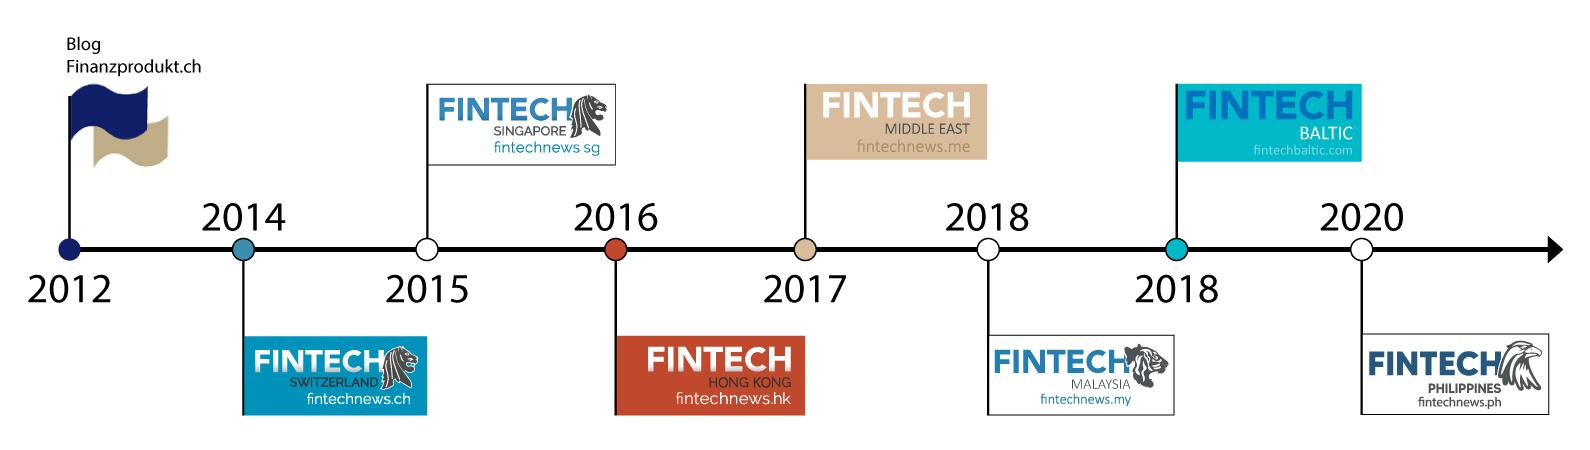 Fintech News Network Timelines, October 2020